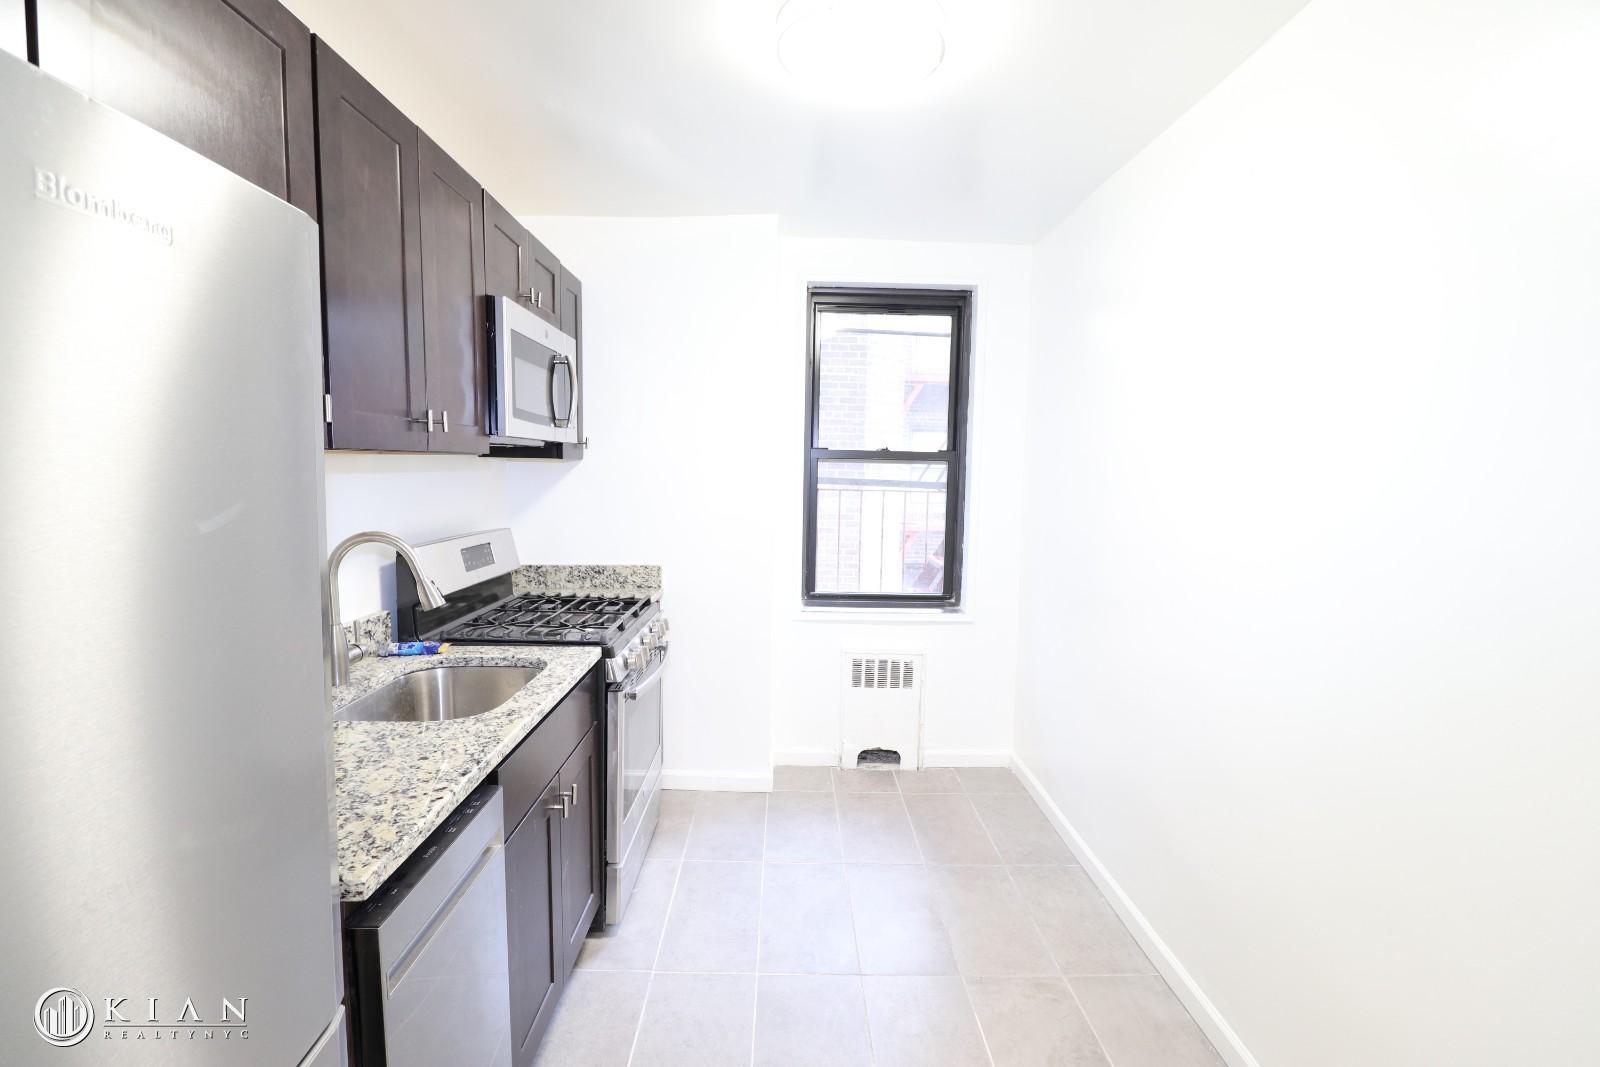 132-61 Sanford Avenue, Apt 5B/132, Queens, New York 11355